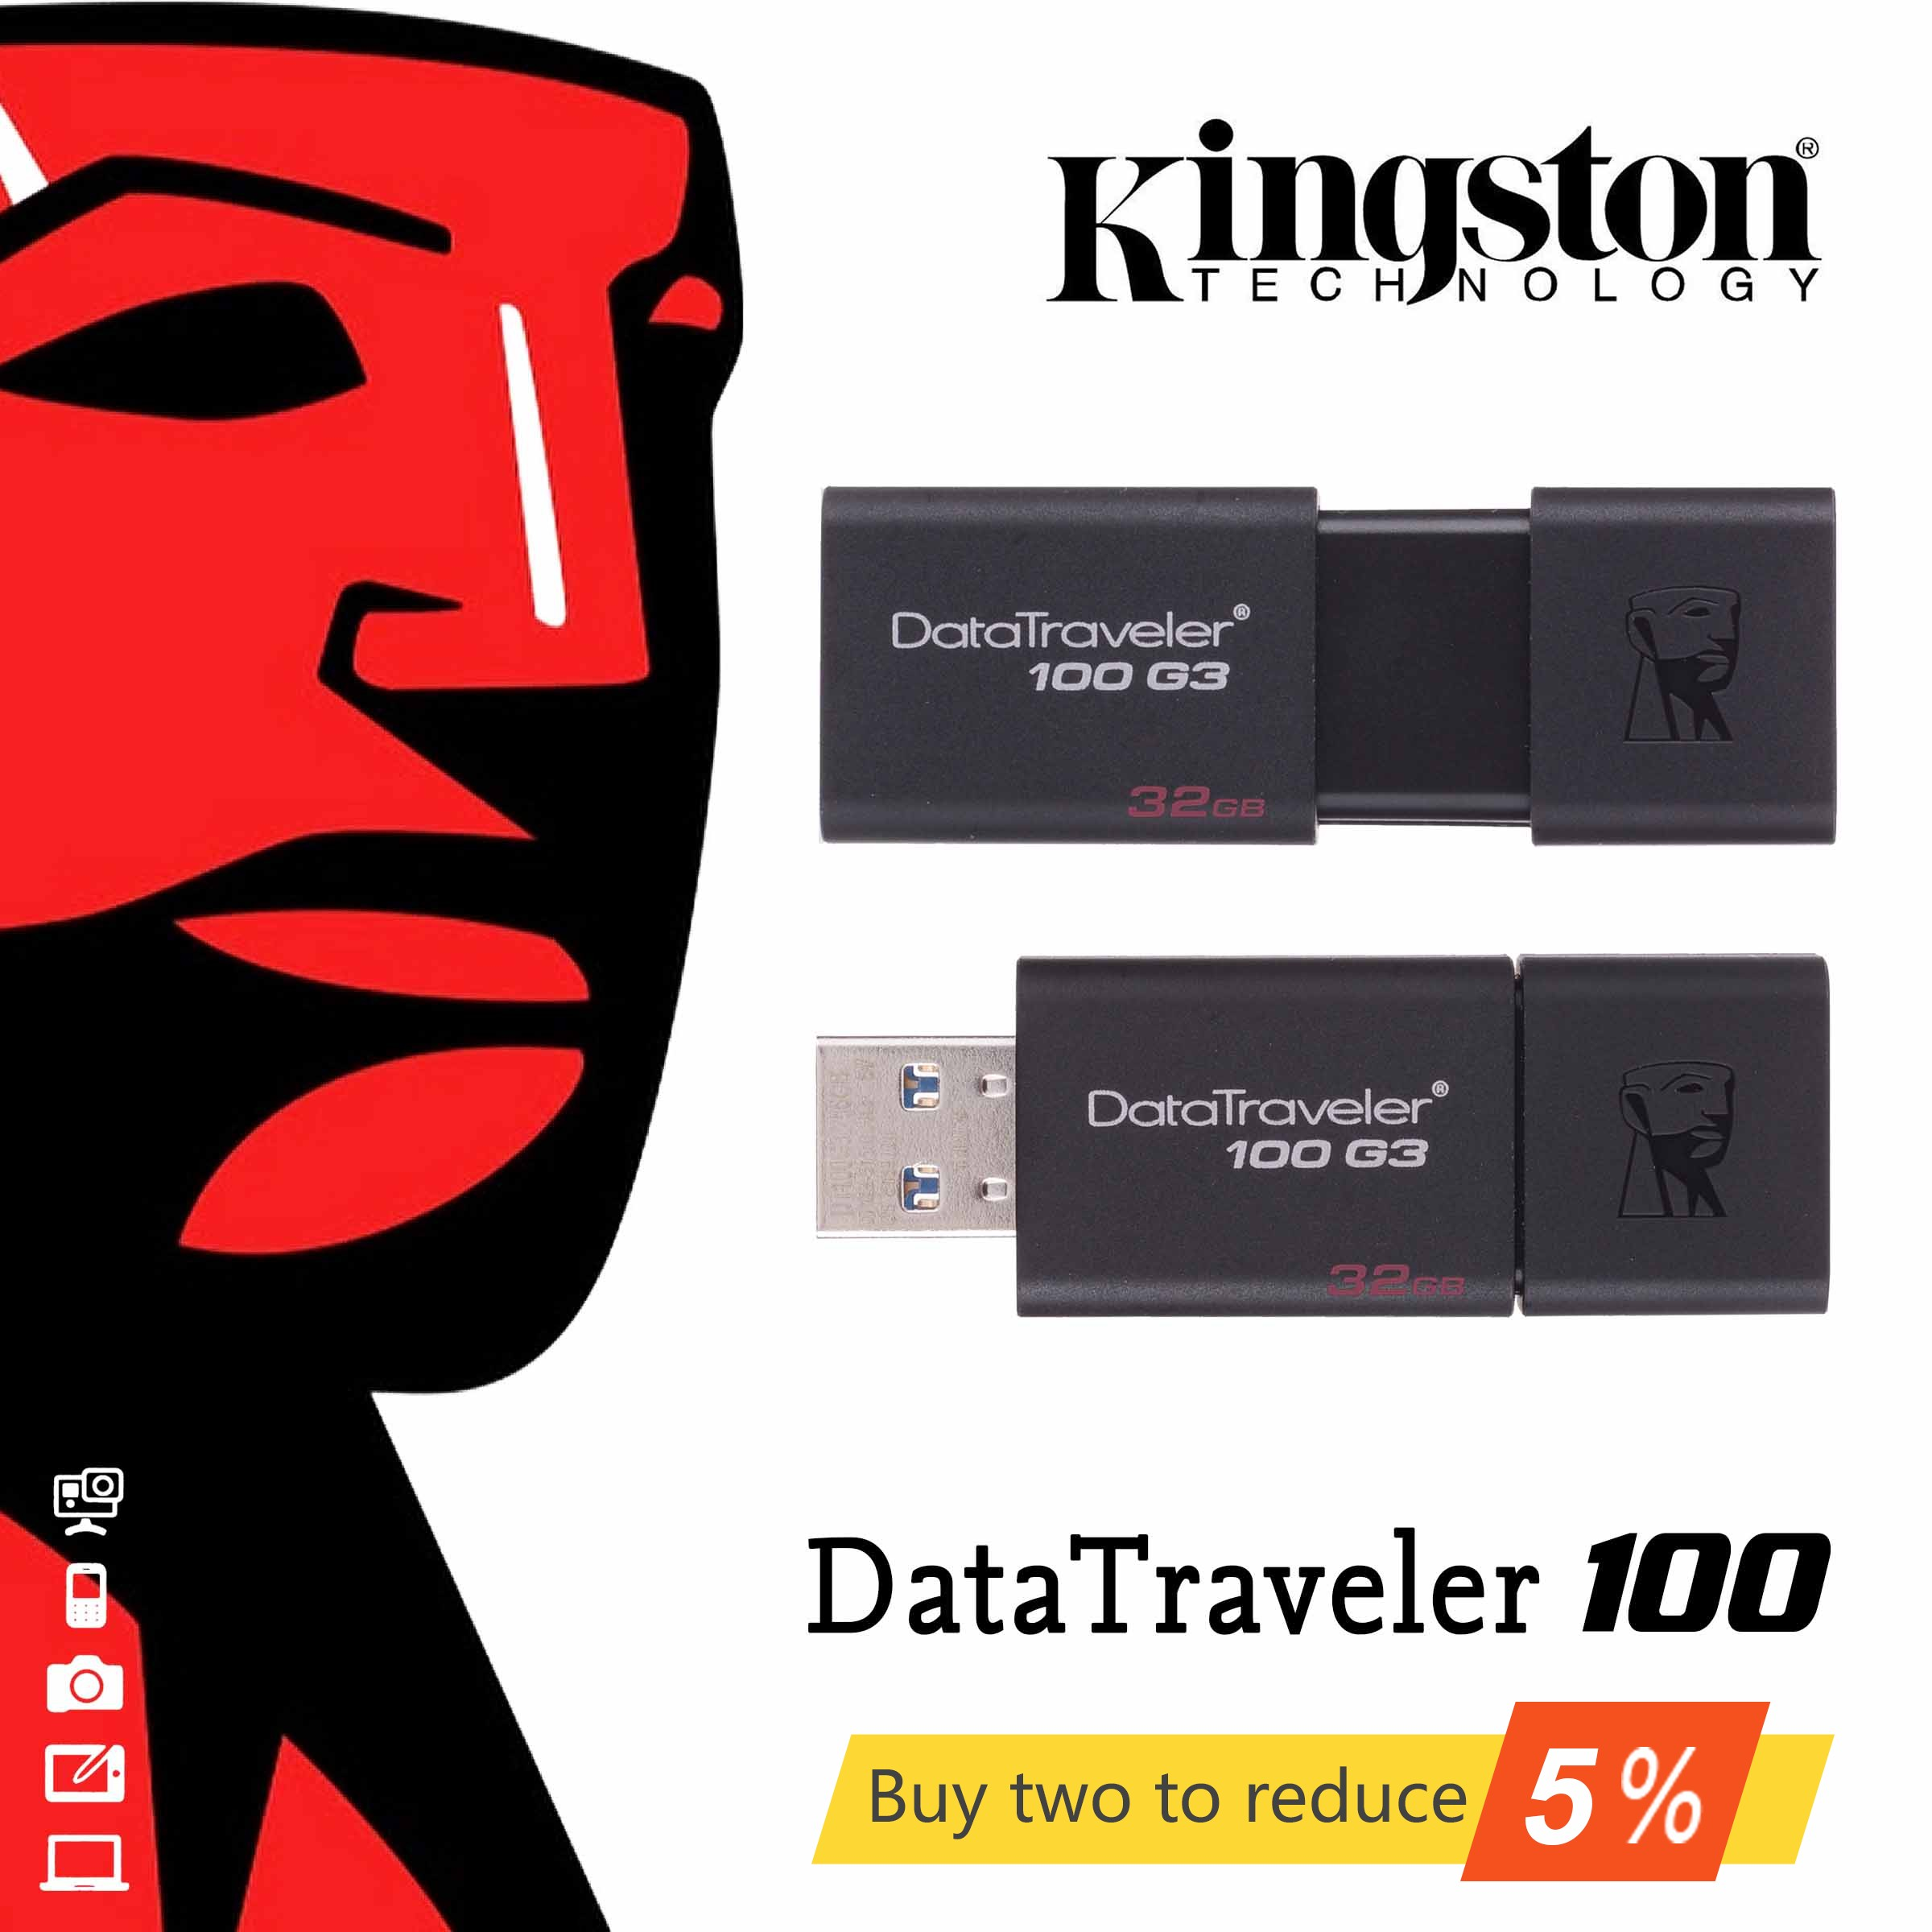 Lecteur Flash USB 3.0 vitesse d'origine Kingston lecteur Flash USB 16 GB 32 GB 64 GB 16 32 64 GB lecteur de clé USB clé USB DT100G3